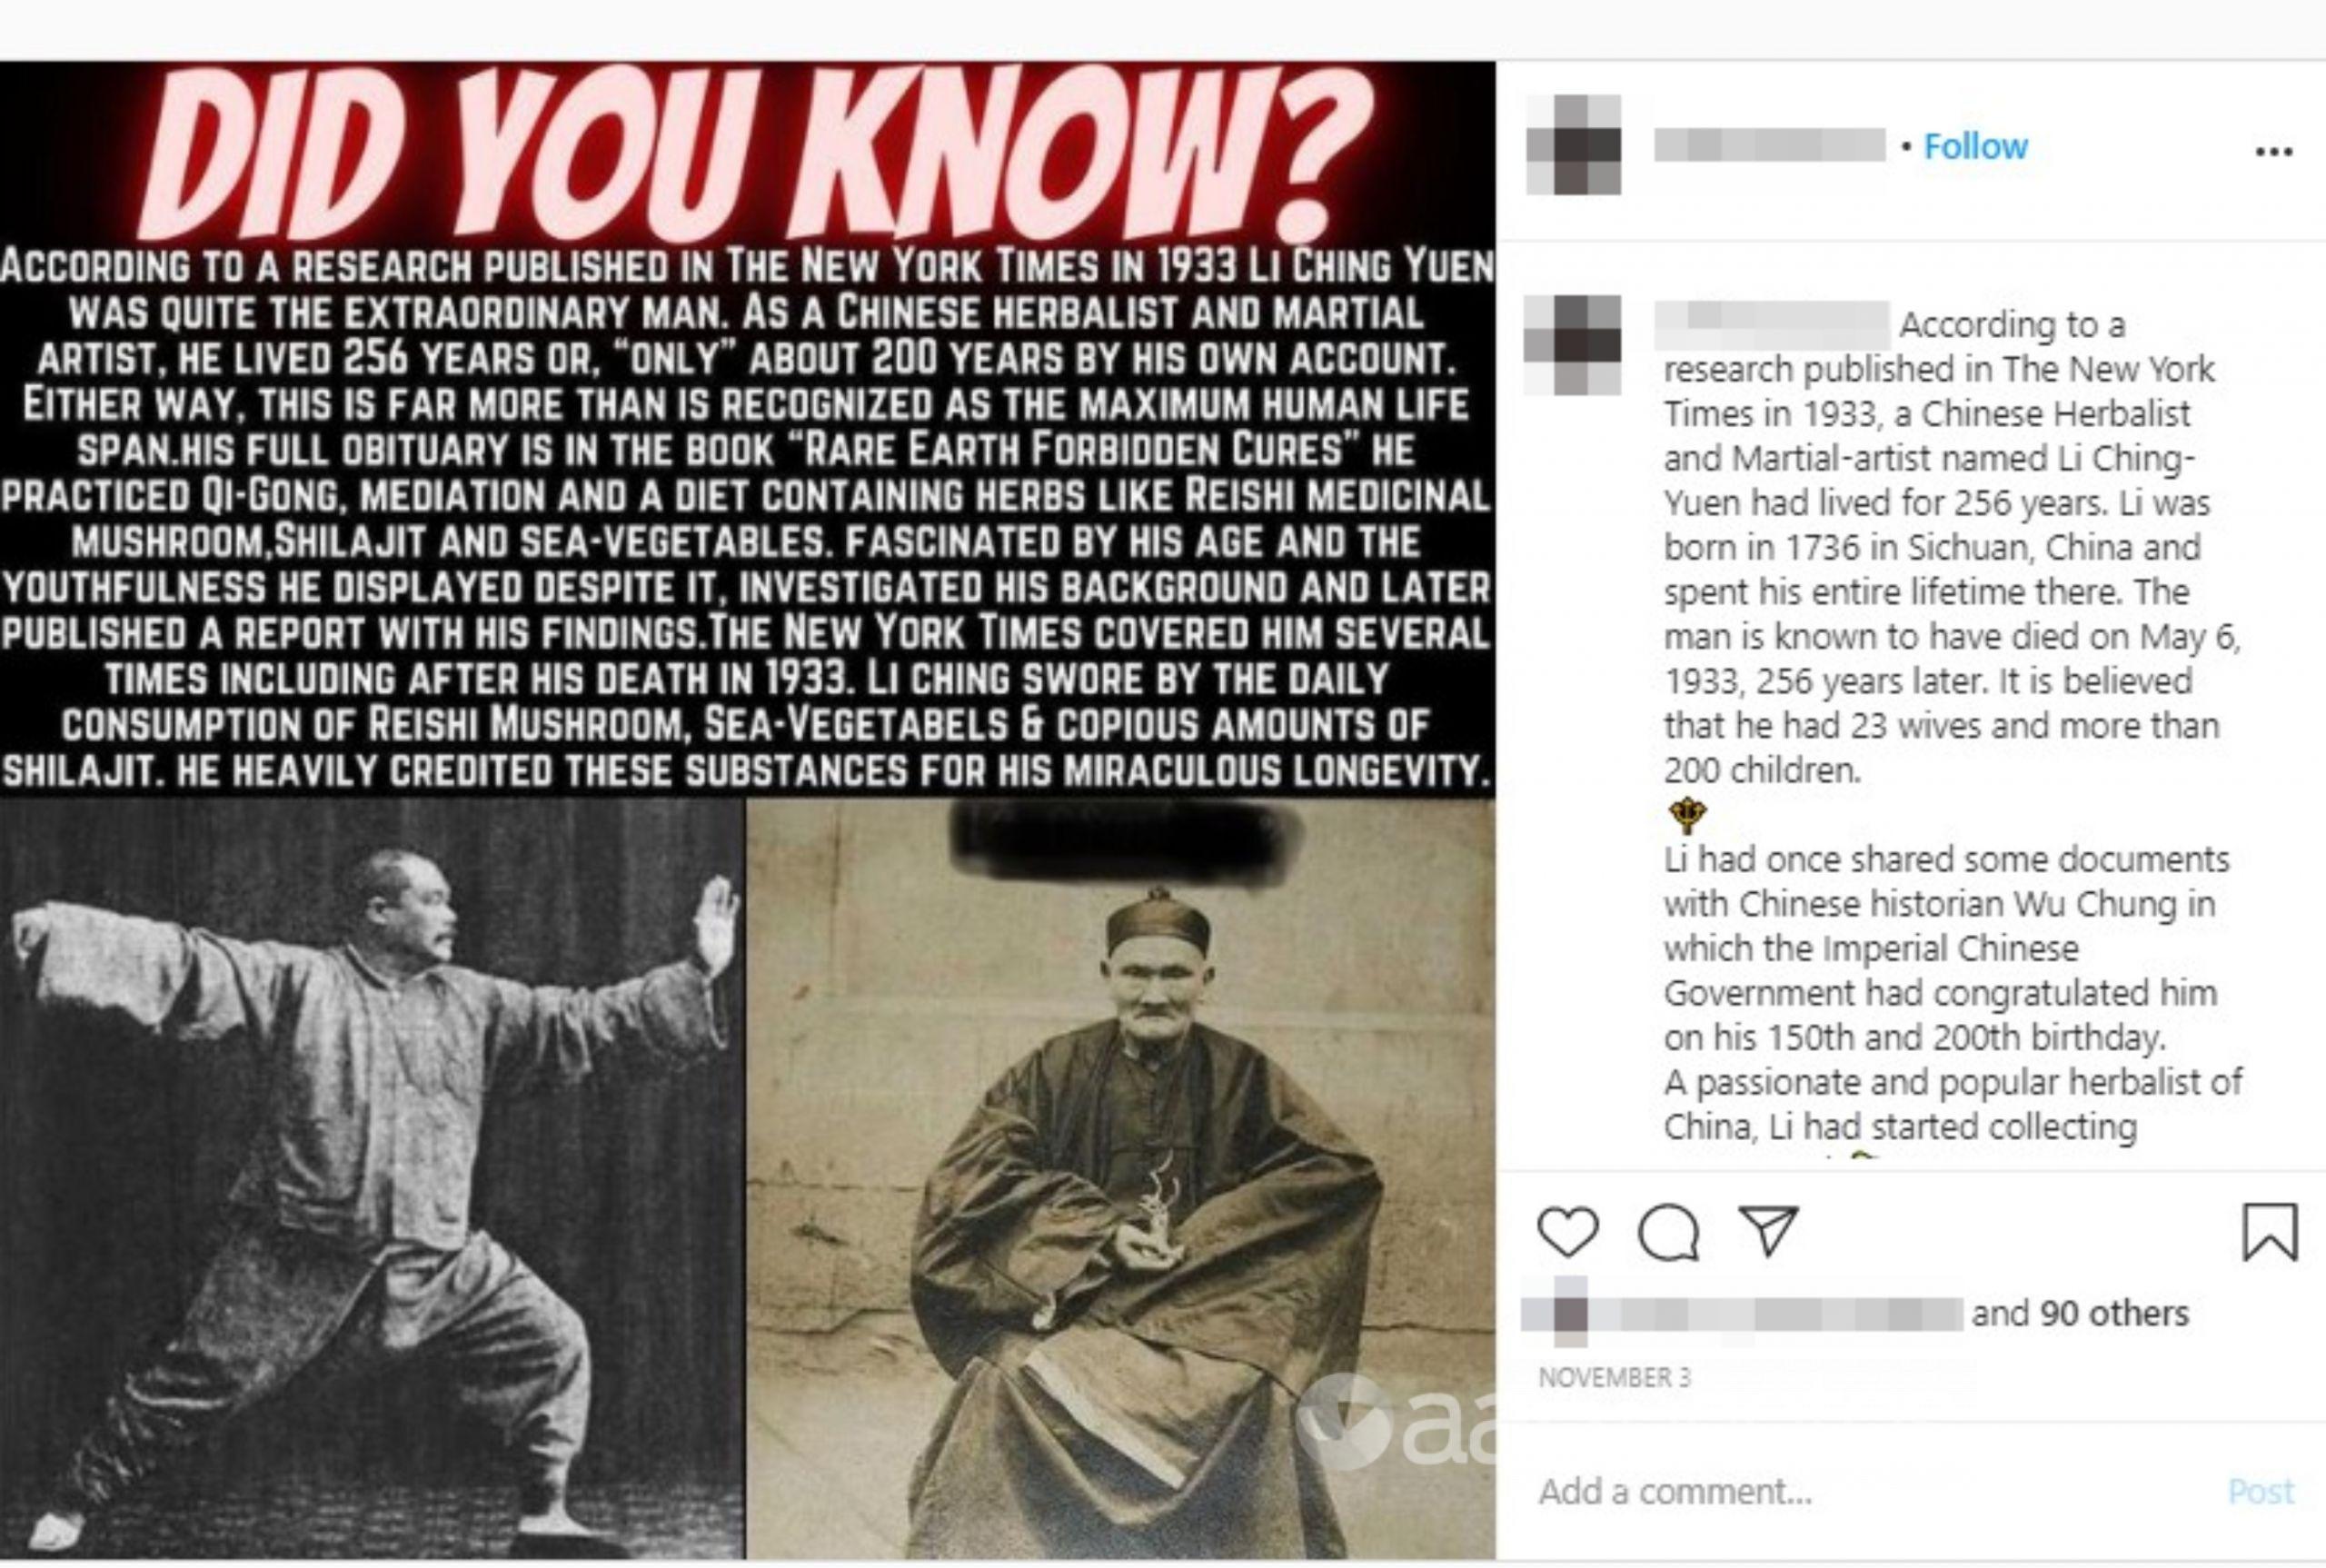 An Instagram post from November 3, 2020